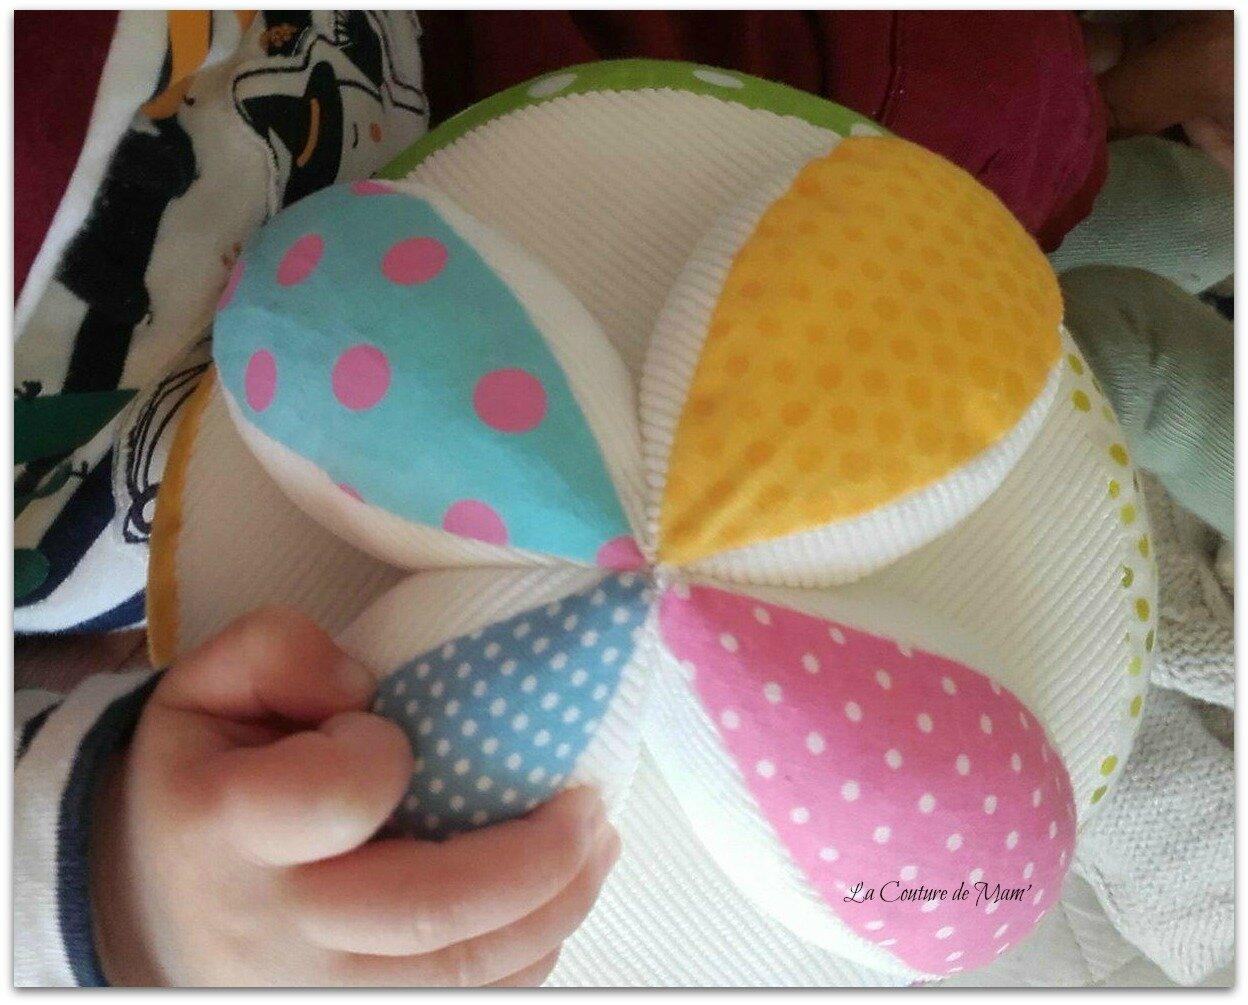 Balles de préhension Montessori (1)